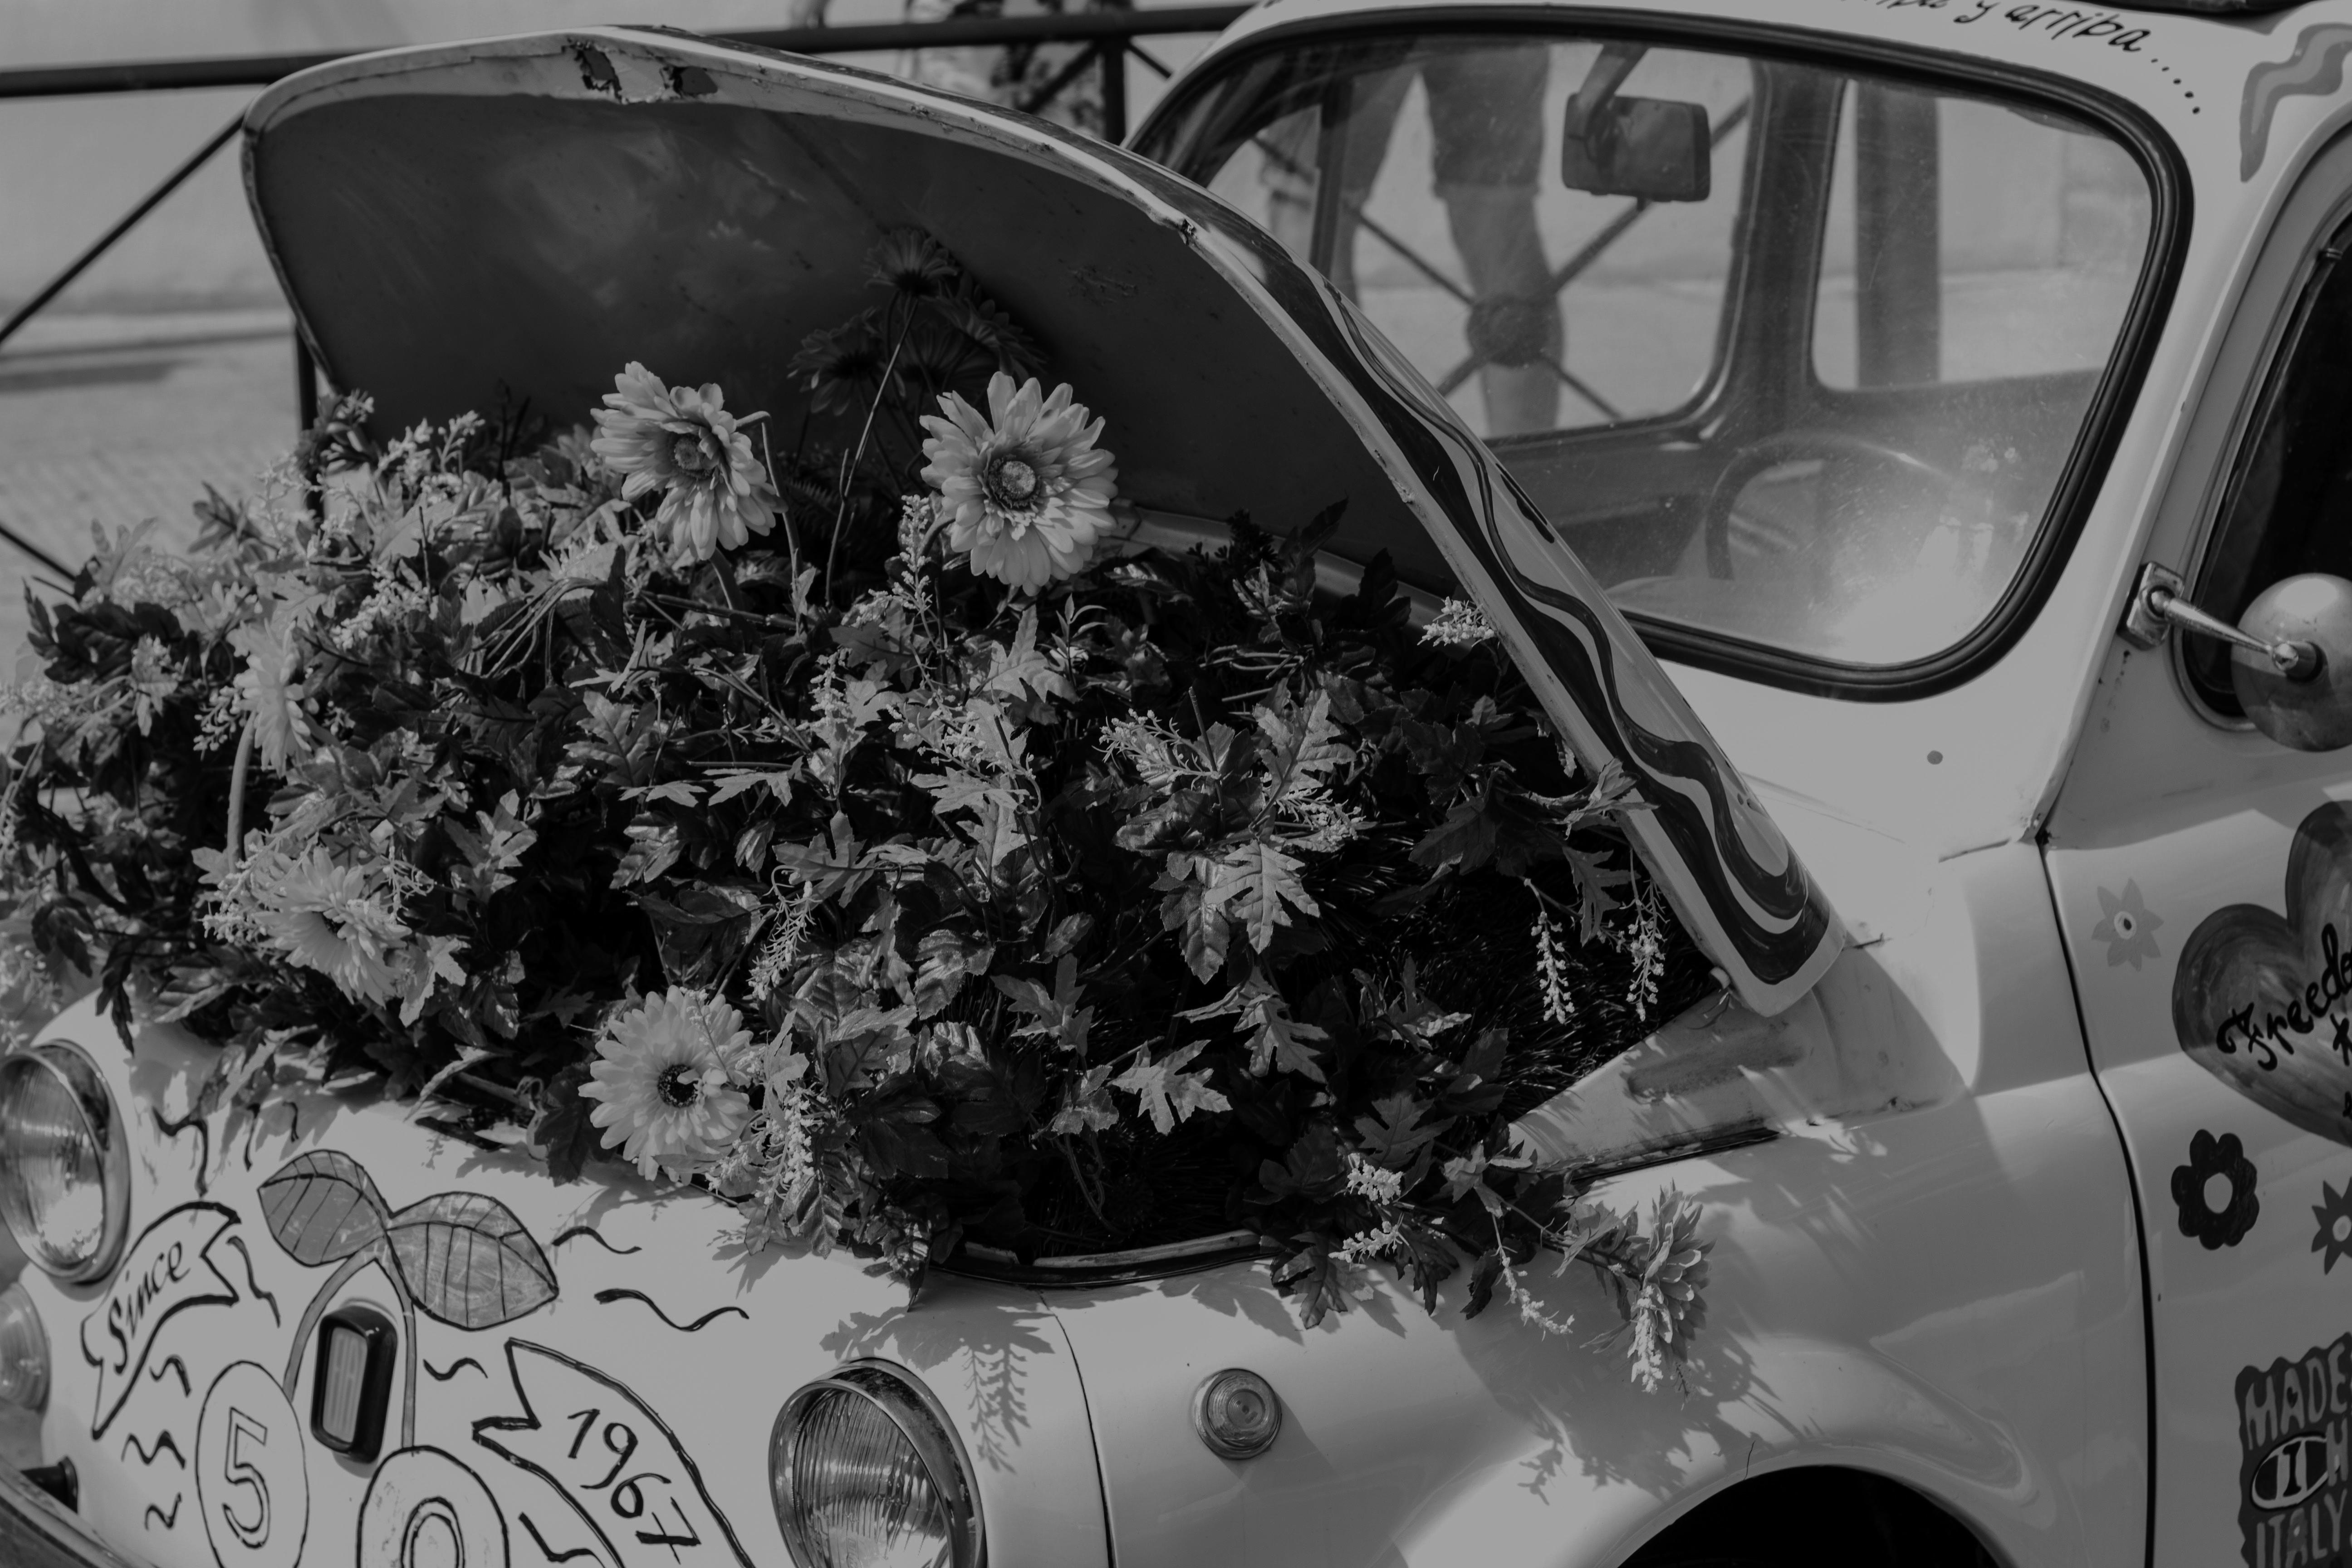 ARMANI X FIAT 500: Sustainable design